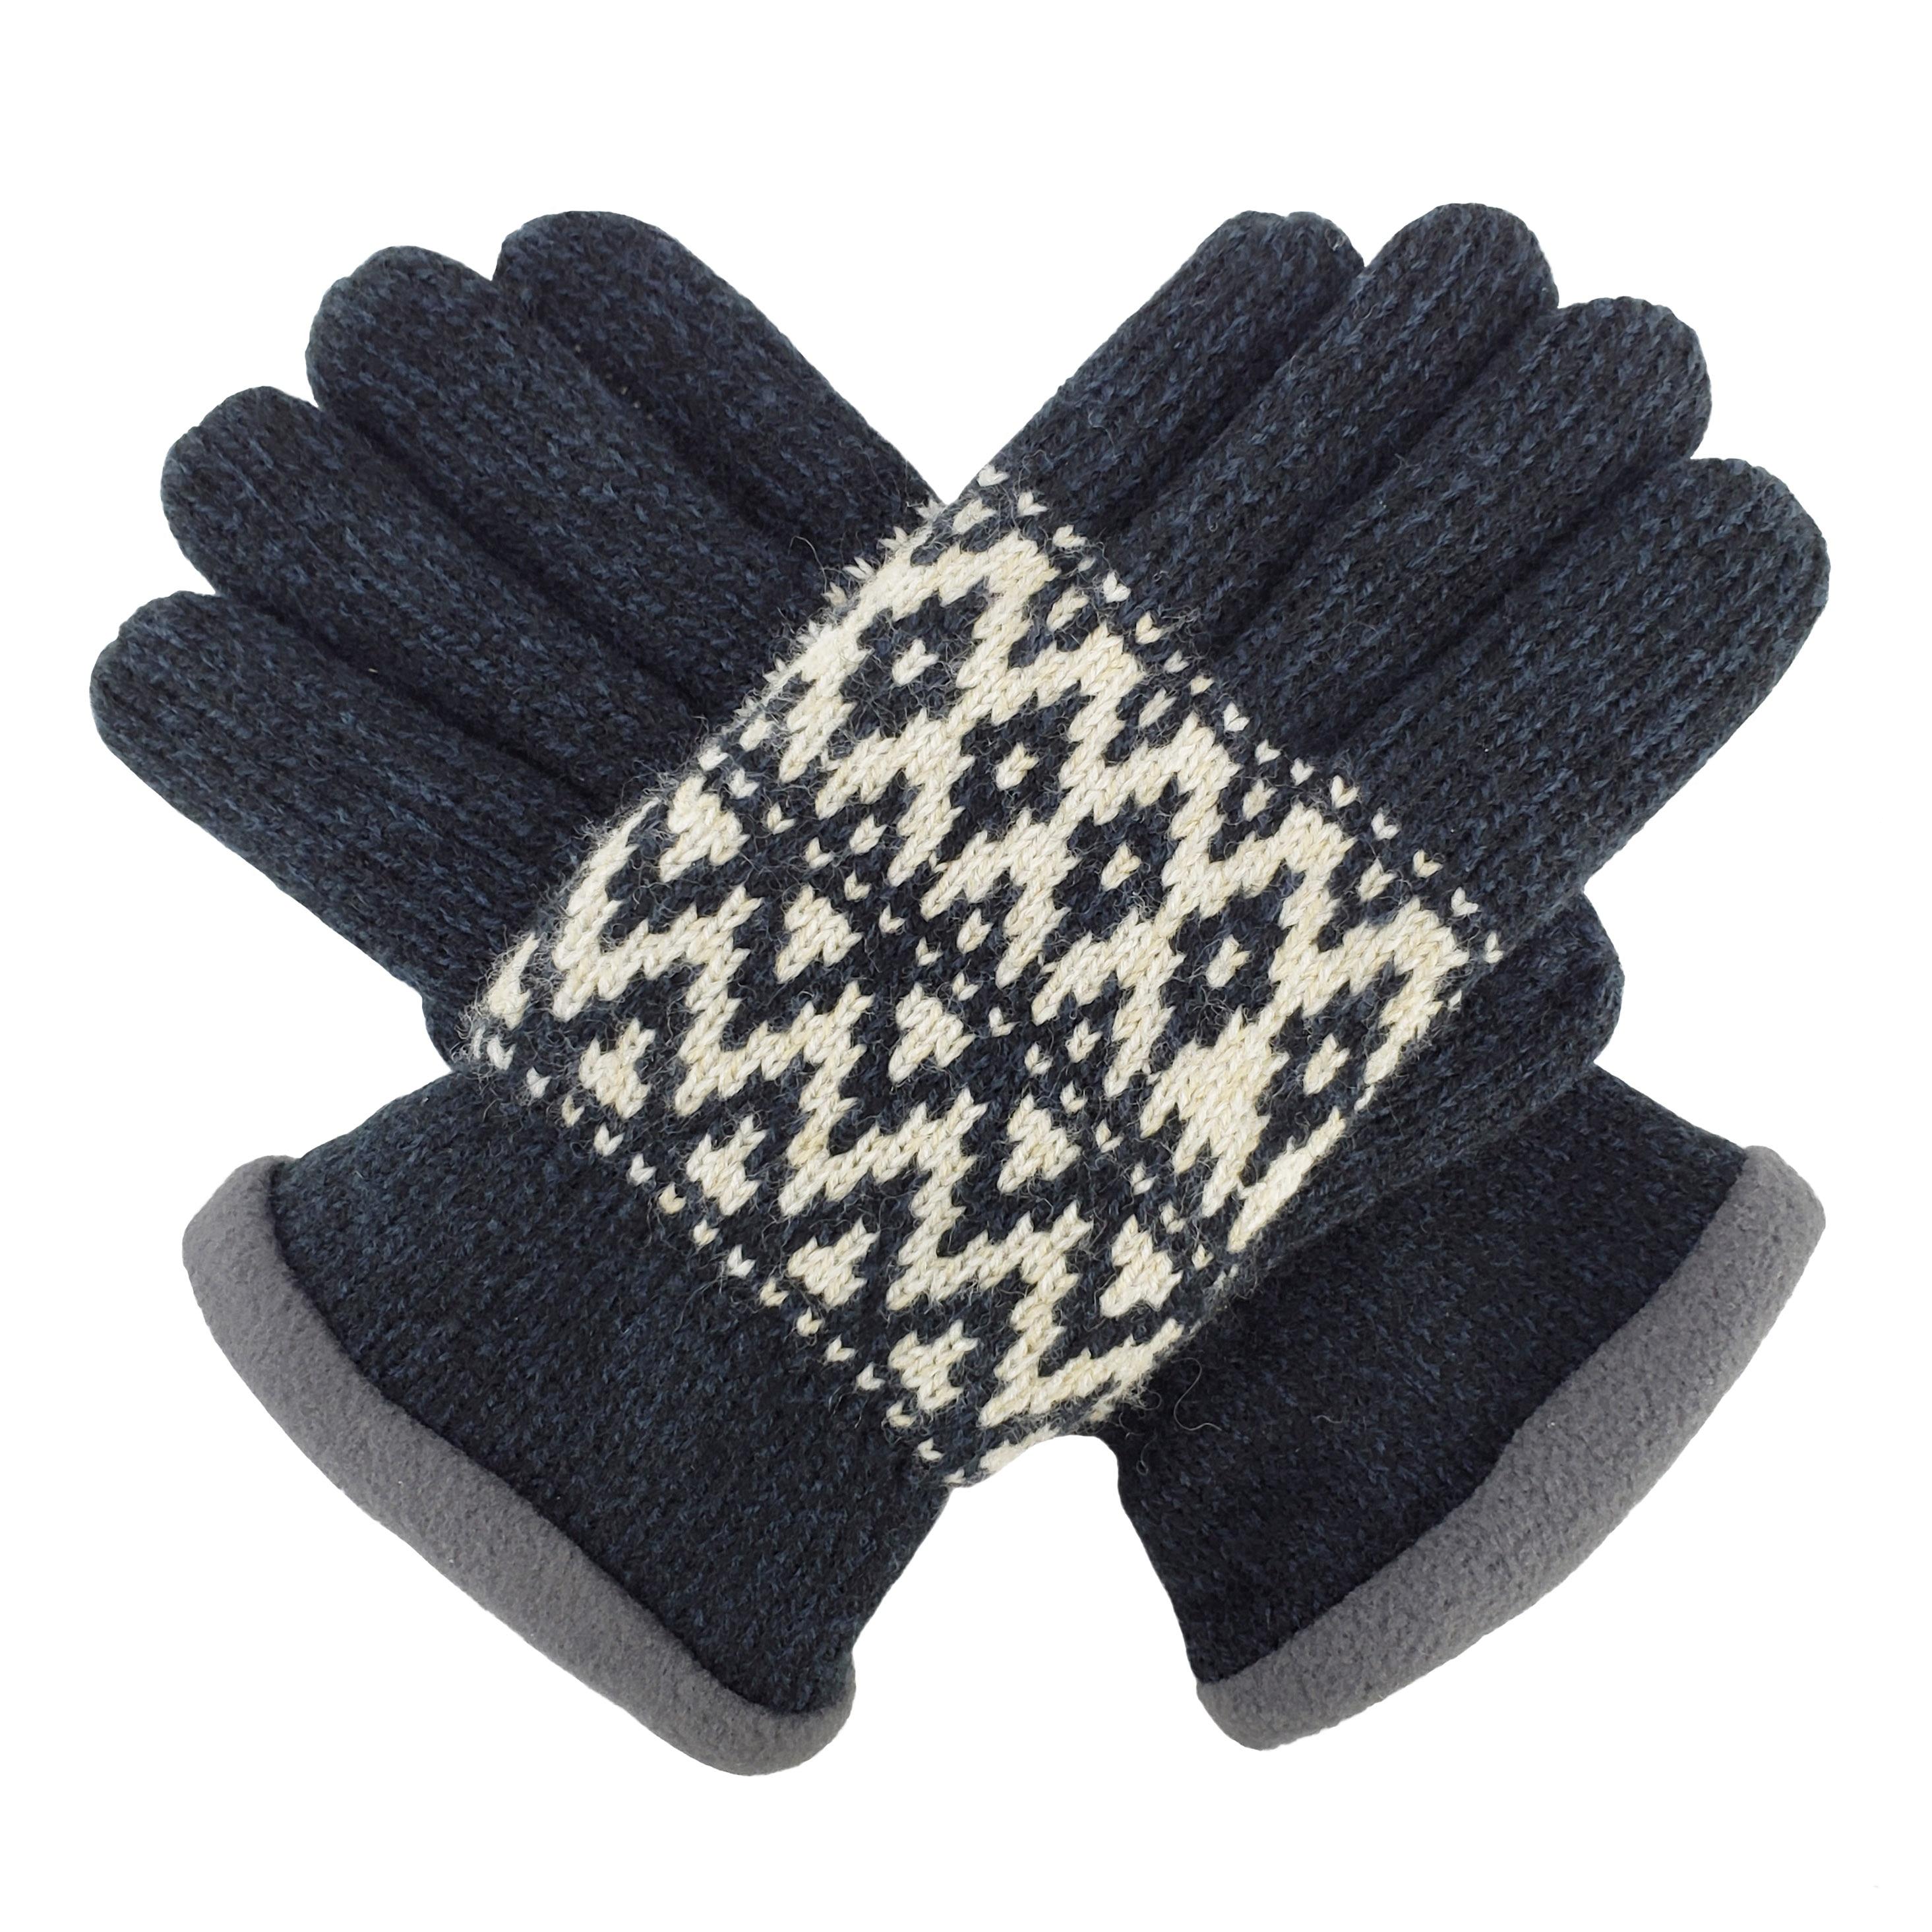 Bruceriver guantes de invierno tejidos para mujer con forro polar de thinsular cálido